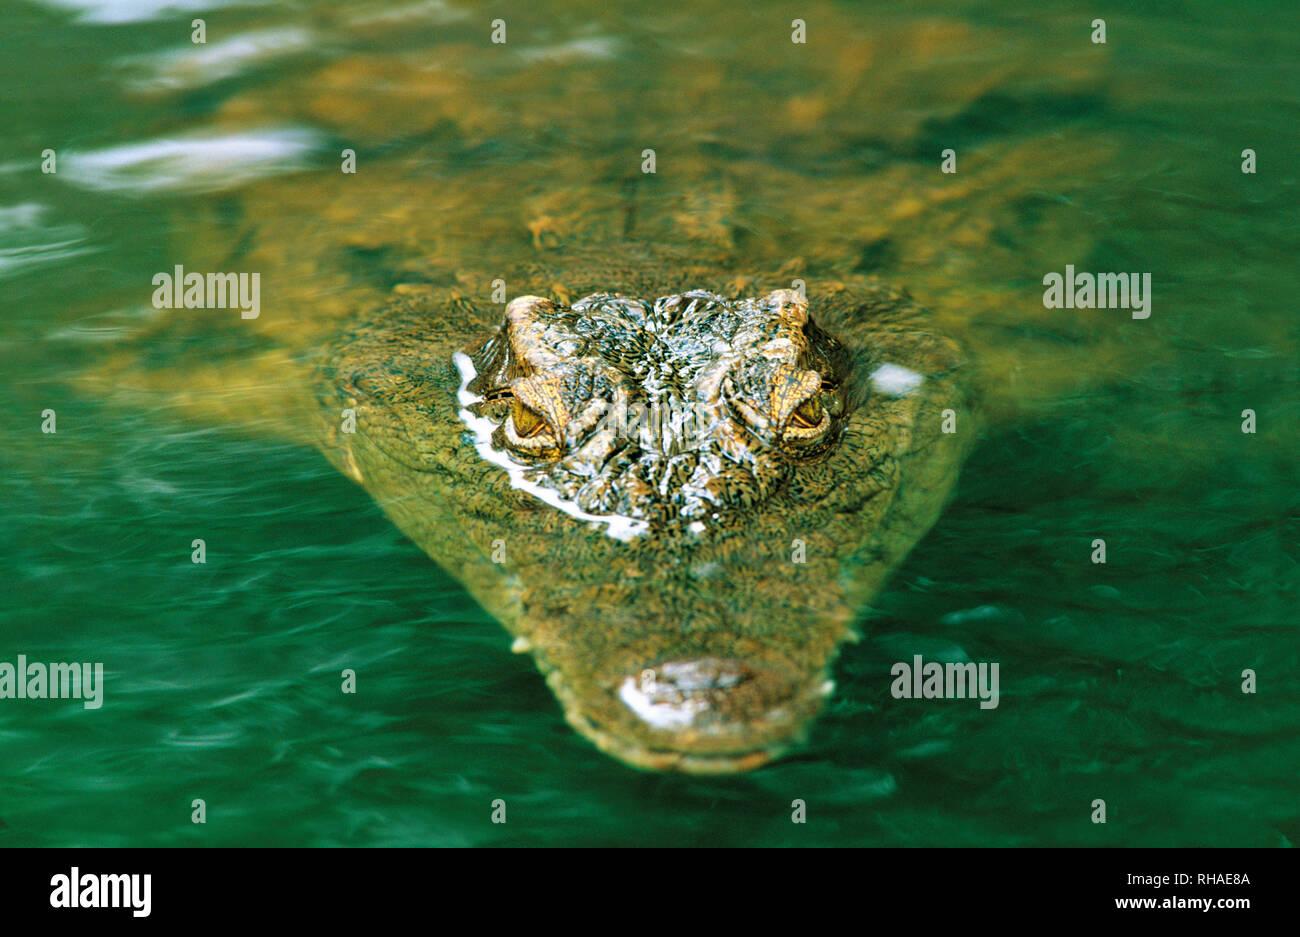 Nil-Krokodil (Crocodylus niloticus) in der Crocodile Ranch in Victoria Falls (Zimbabwe, Afrika) - Stock Image